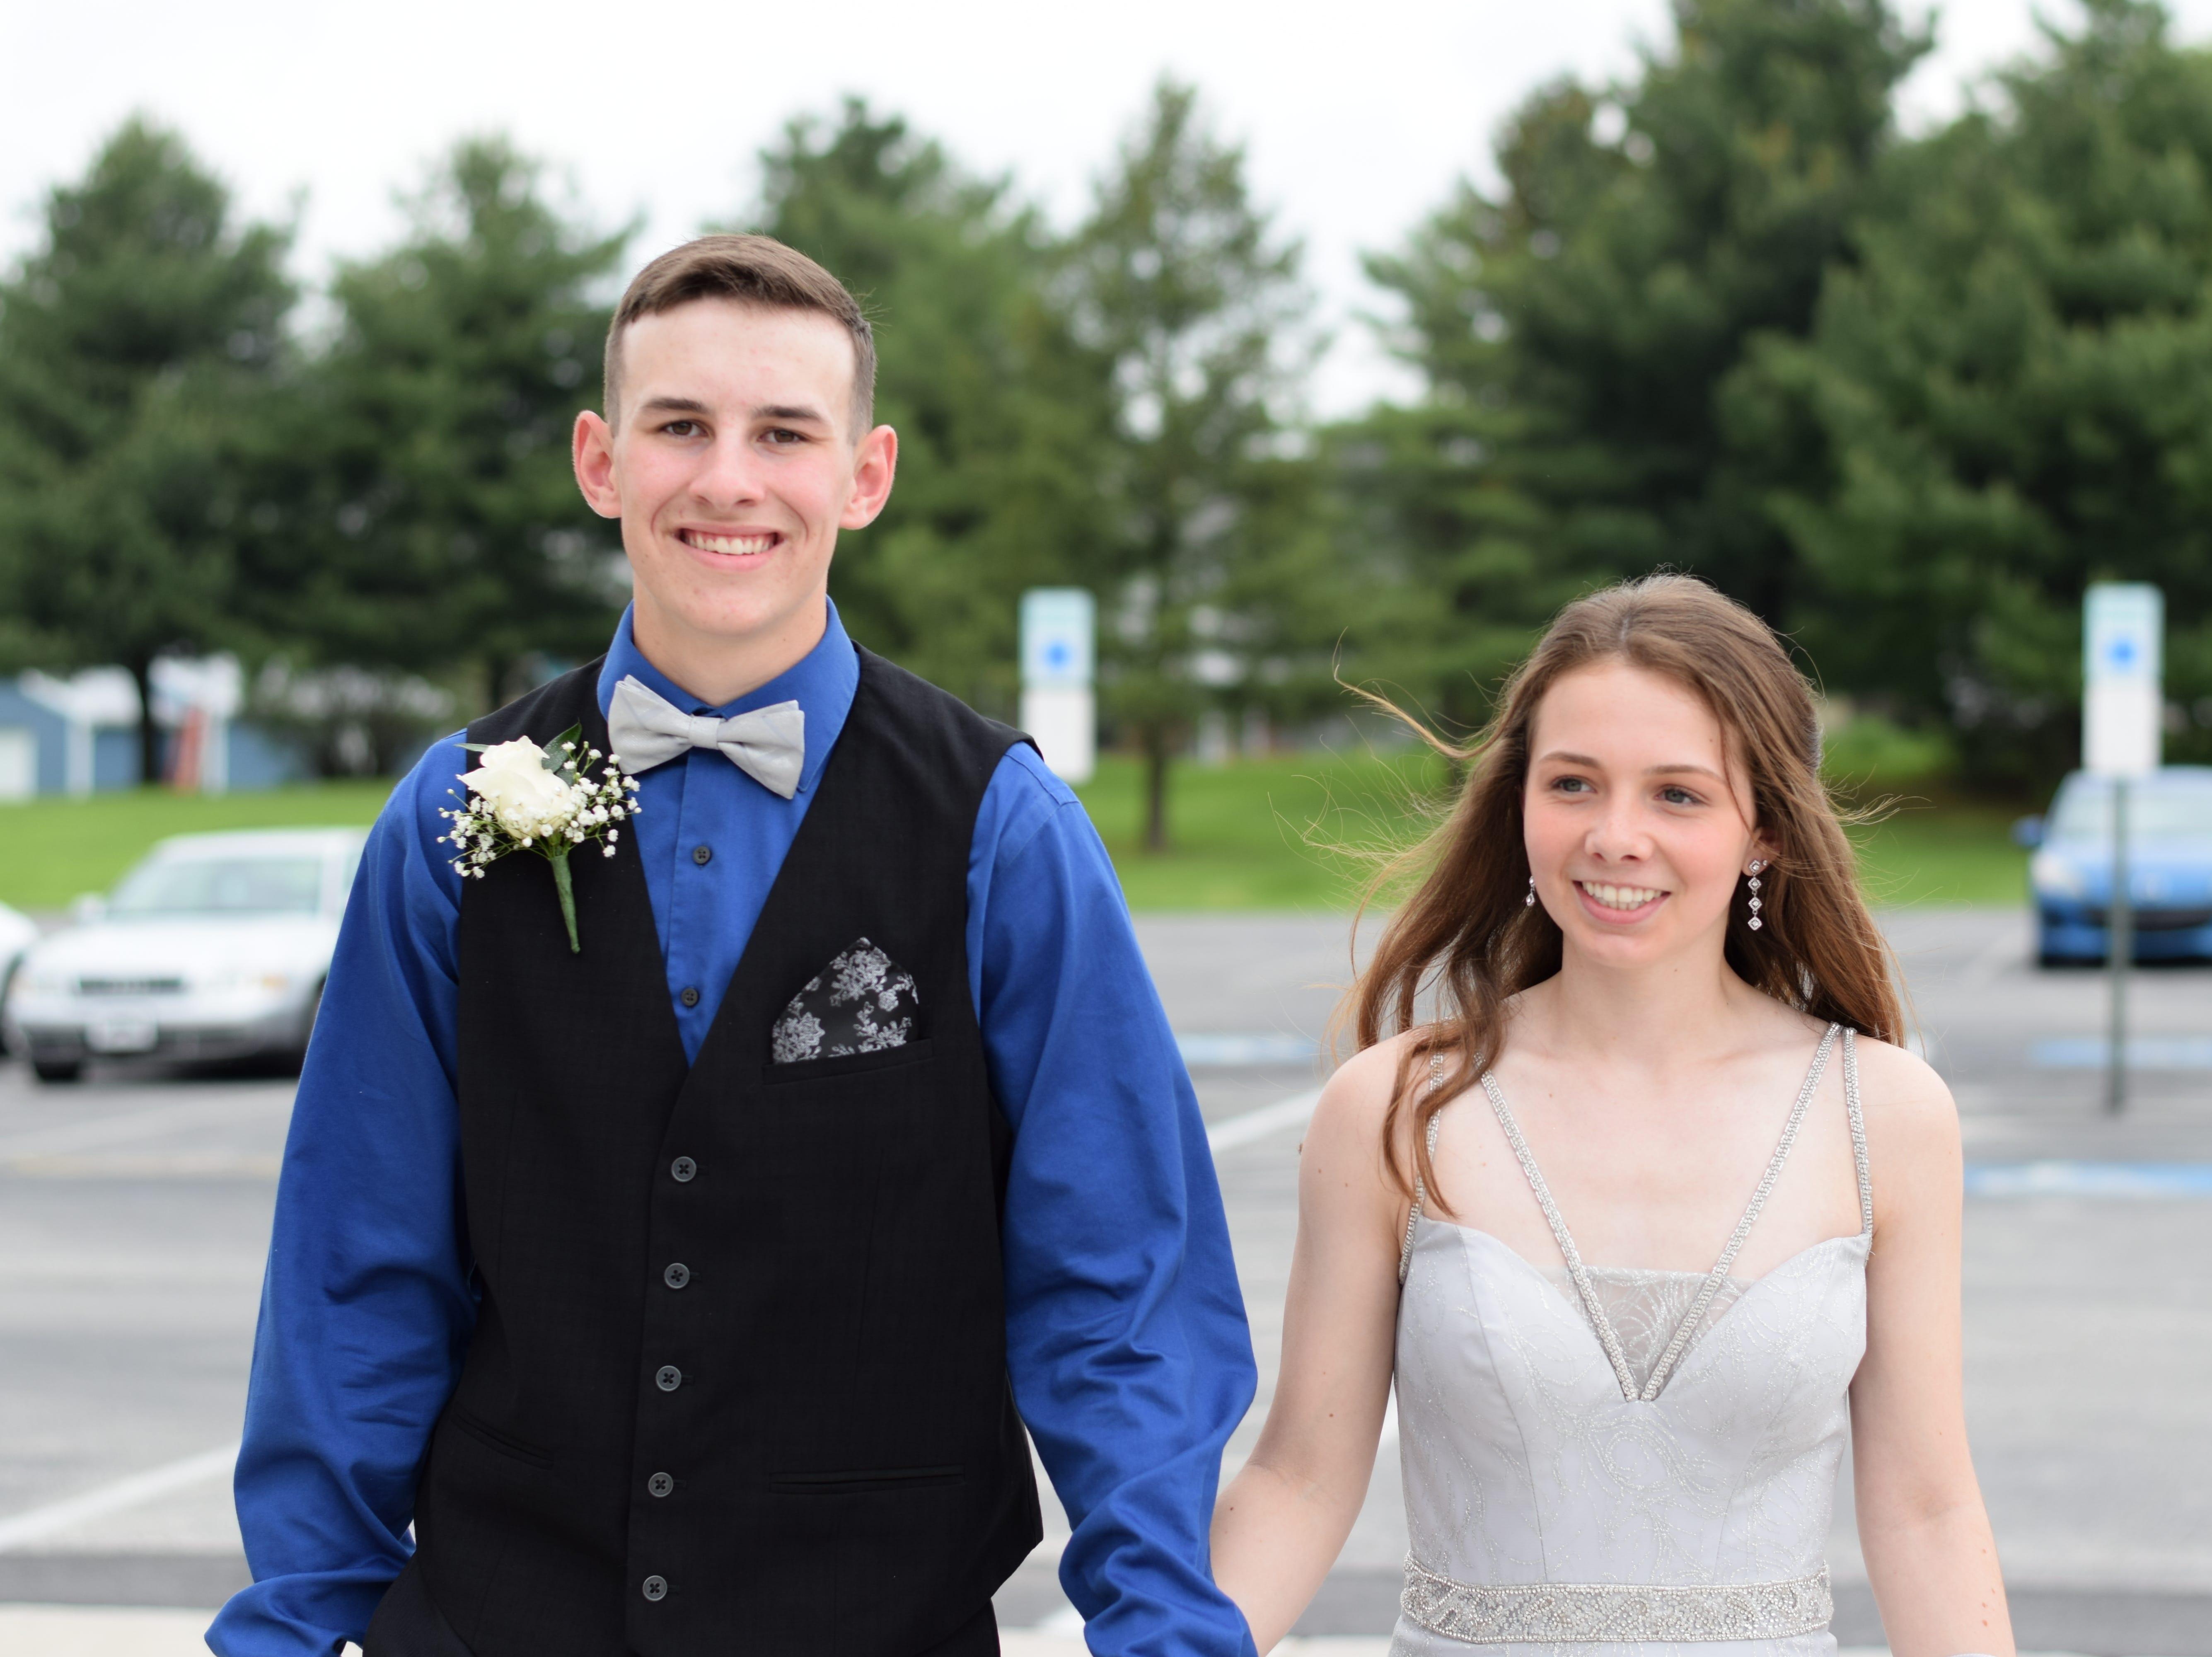 Christian School of York students held their 2019 prom Saturday, May 4. Jennifer King phot